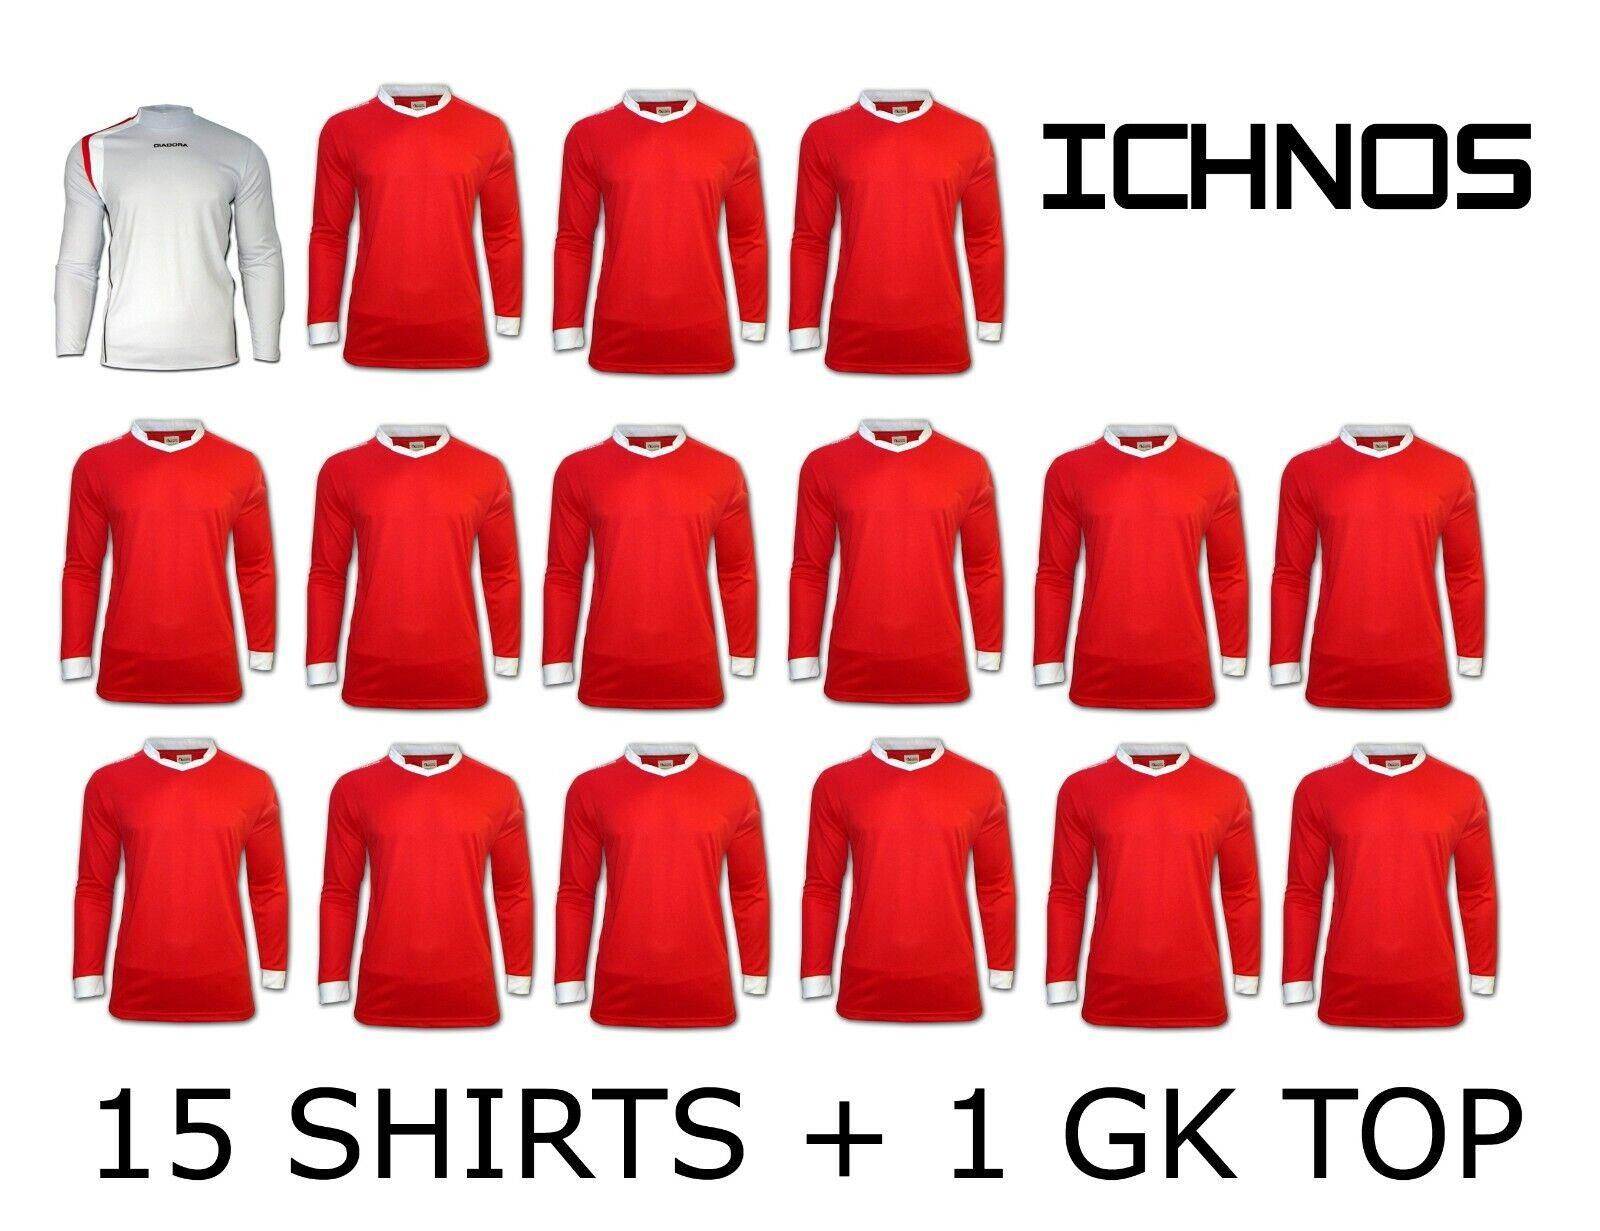 ICHNOS Rojo Adulto equipo Match Day Kit Fútbol Camisas - 15 jugadores + 1 portero Top